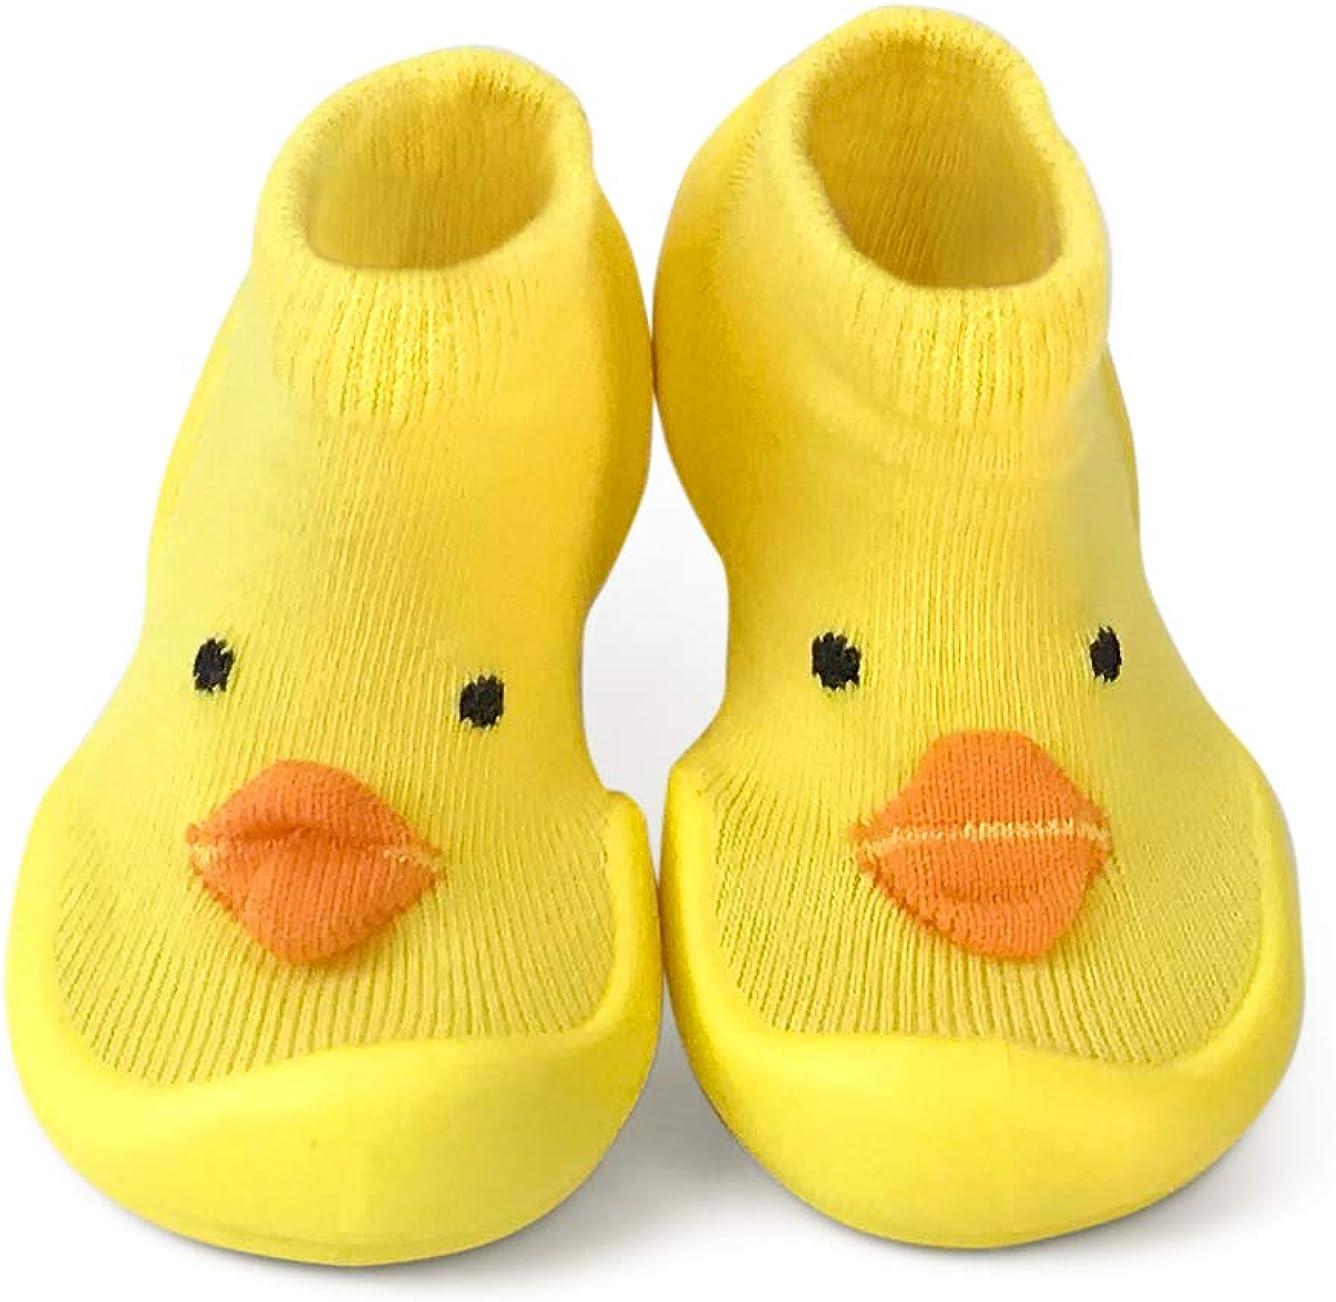 Step Ons Krabbelschuhe Halb Socke Rutschschuhe und Laufschuhe Halb Schuh!